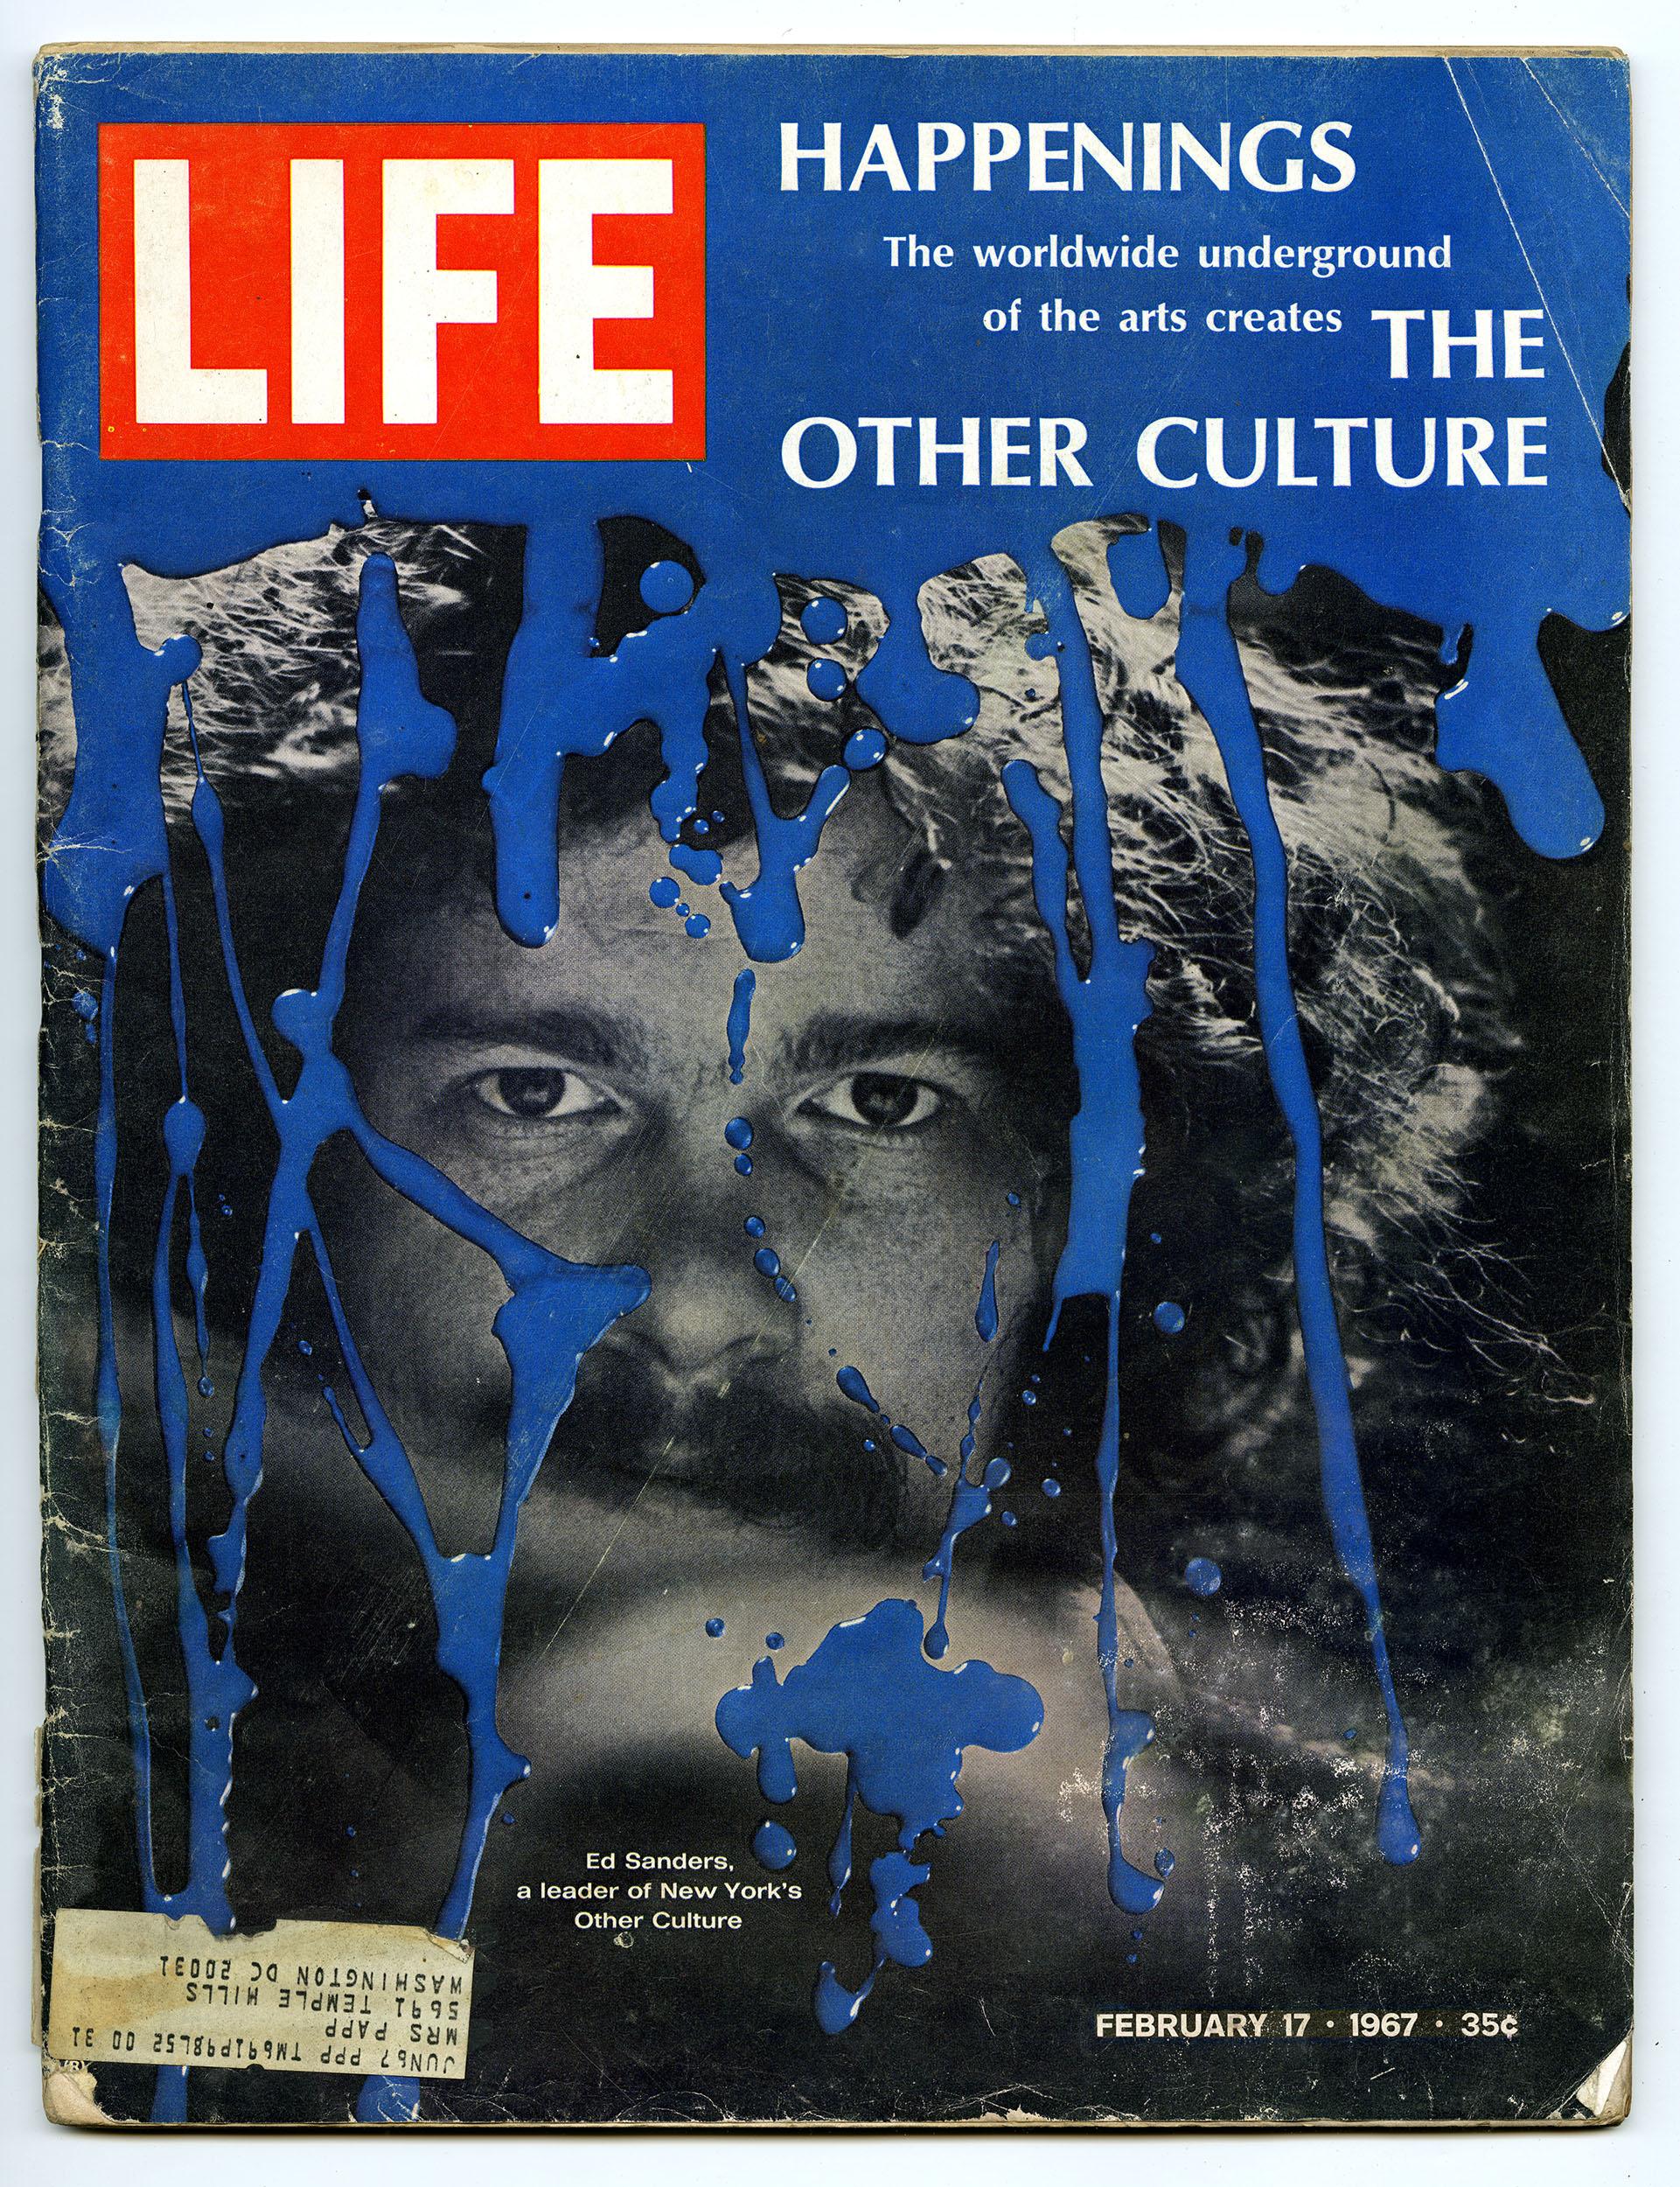 Life, Feb. 17, 1967